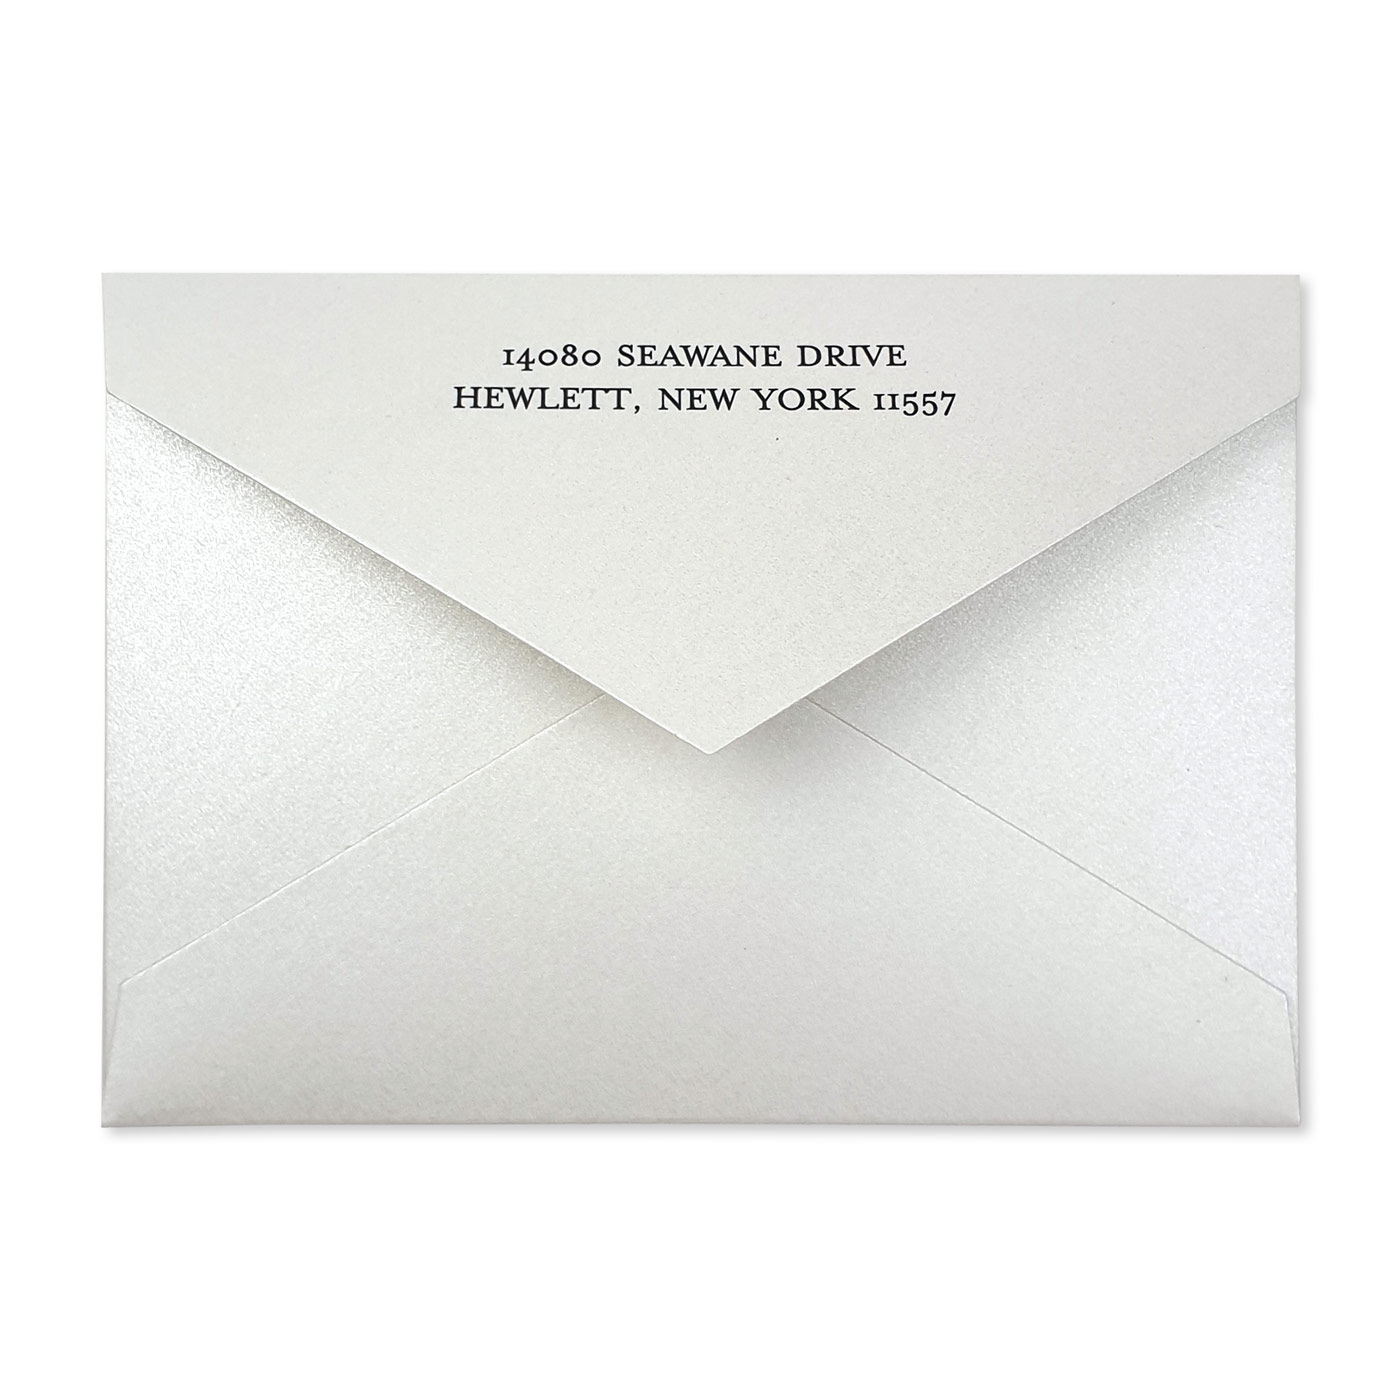 Thank You Cards : TYC-IMPRESSION - 123WeddingCards